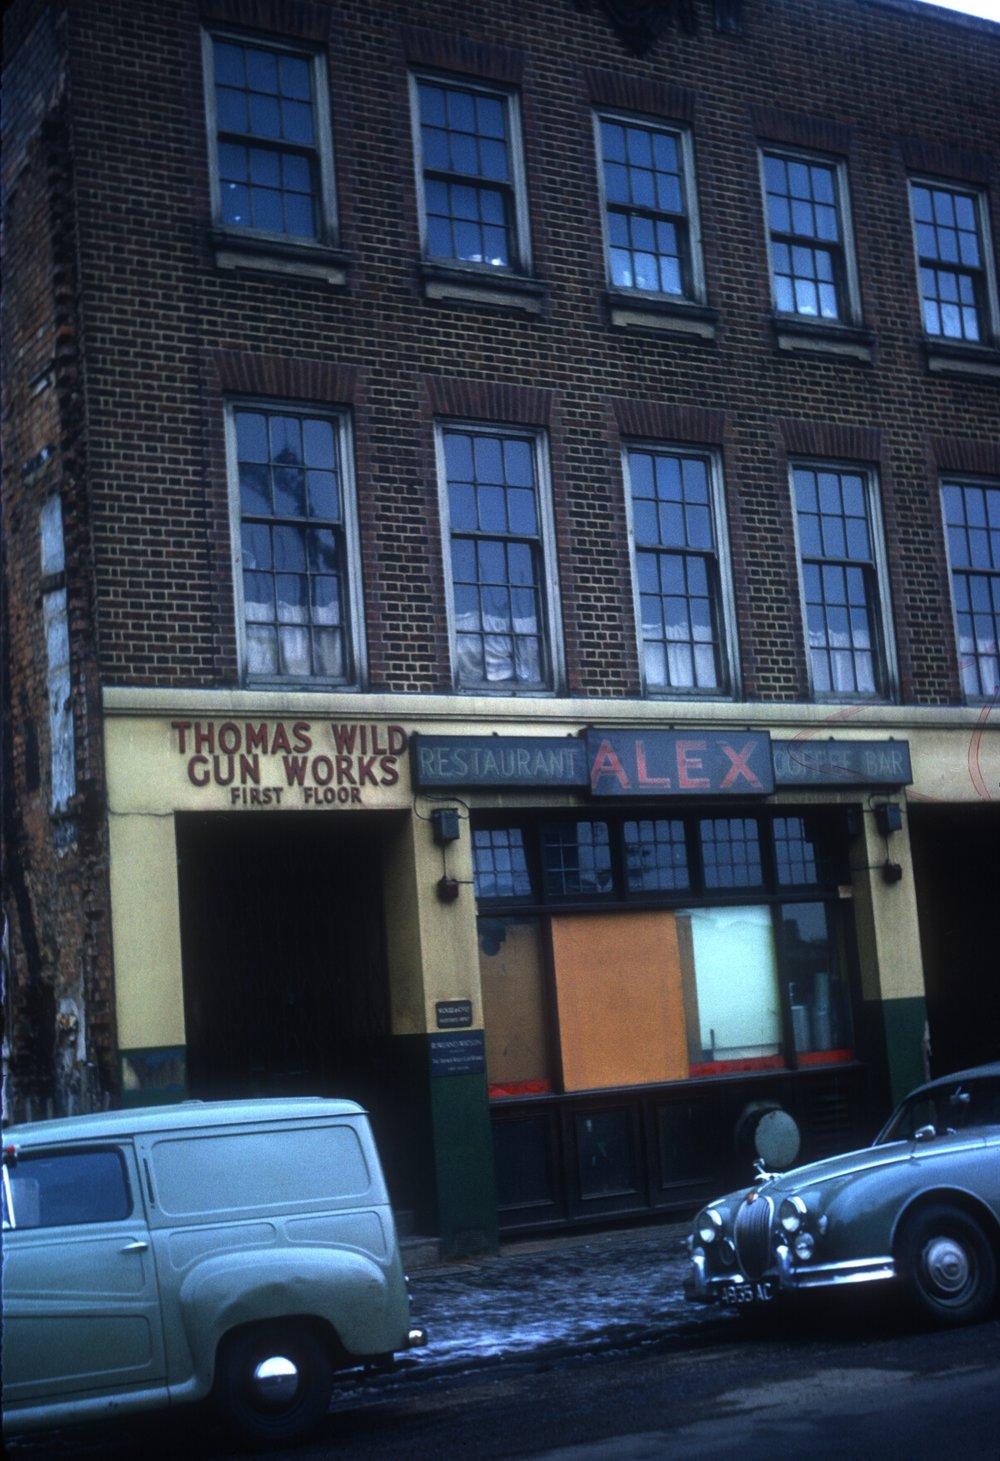 Gun Quarter. Thomas Wyld Gunworks, 1st Floor, No.16 Whittall Street. 16th February 1963